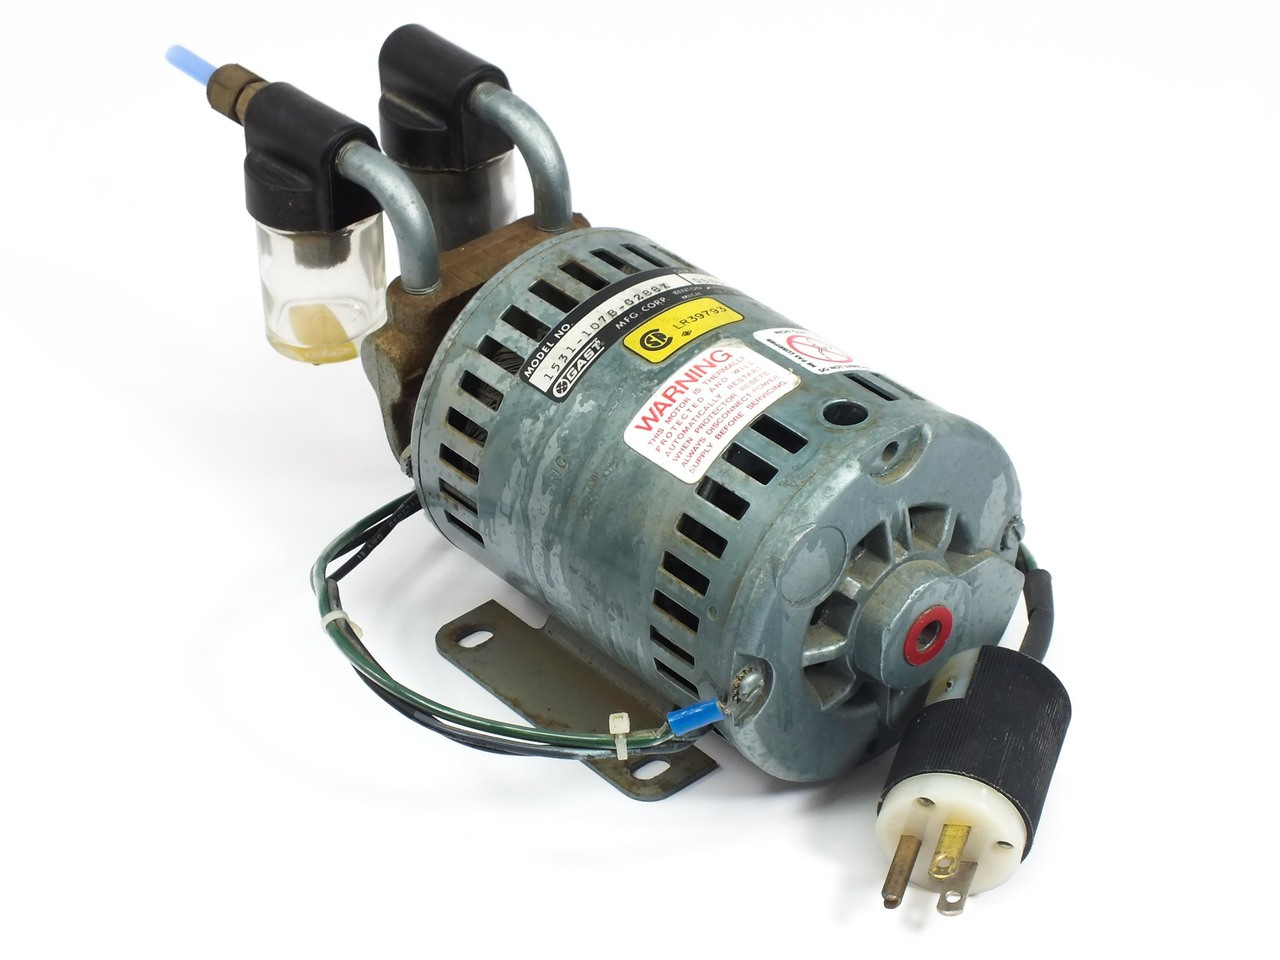 gast vacuum pump wiring diagram rh 9xmaza us Vacuum Pump Drawing Liquid Ring Vacuum Pump System Design